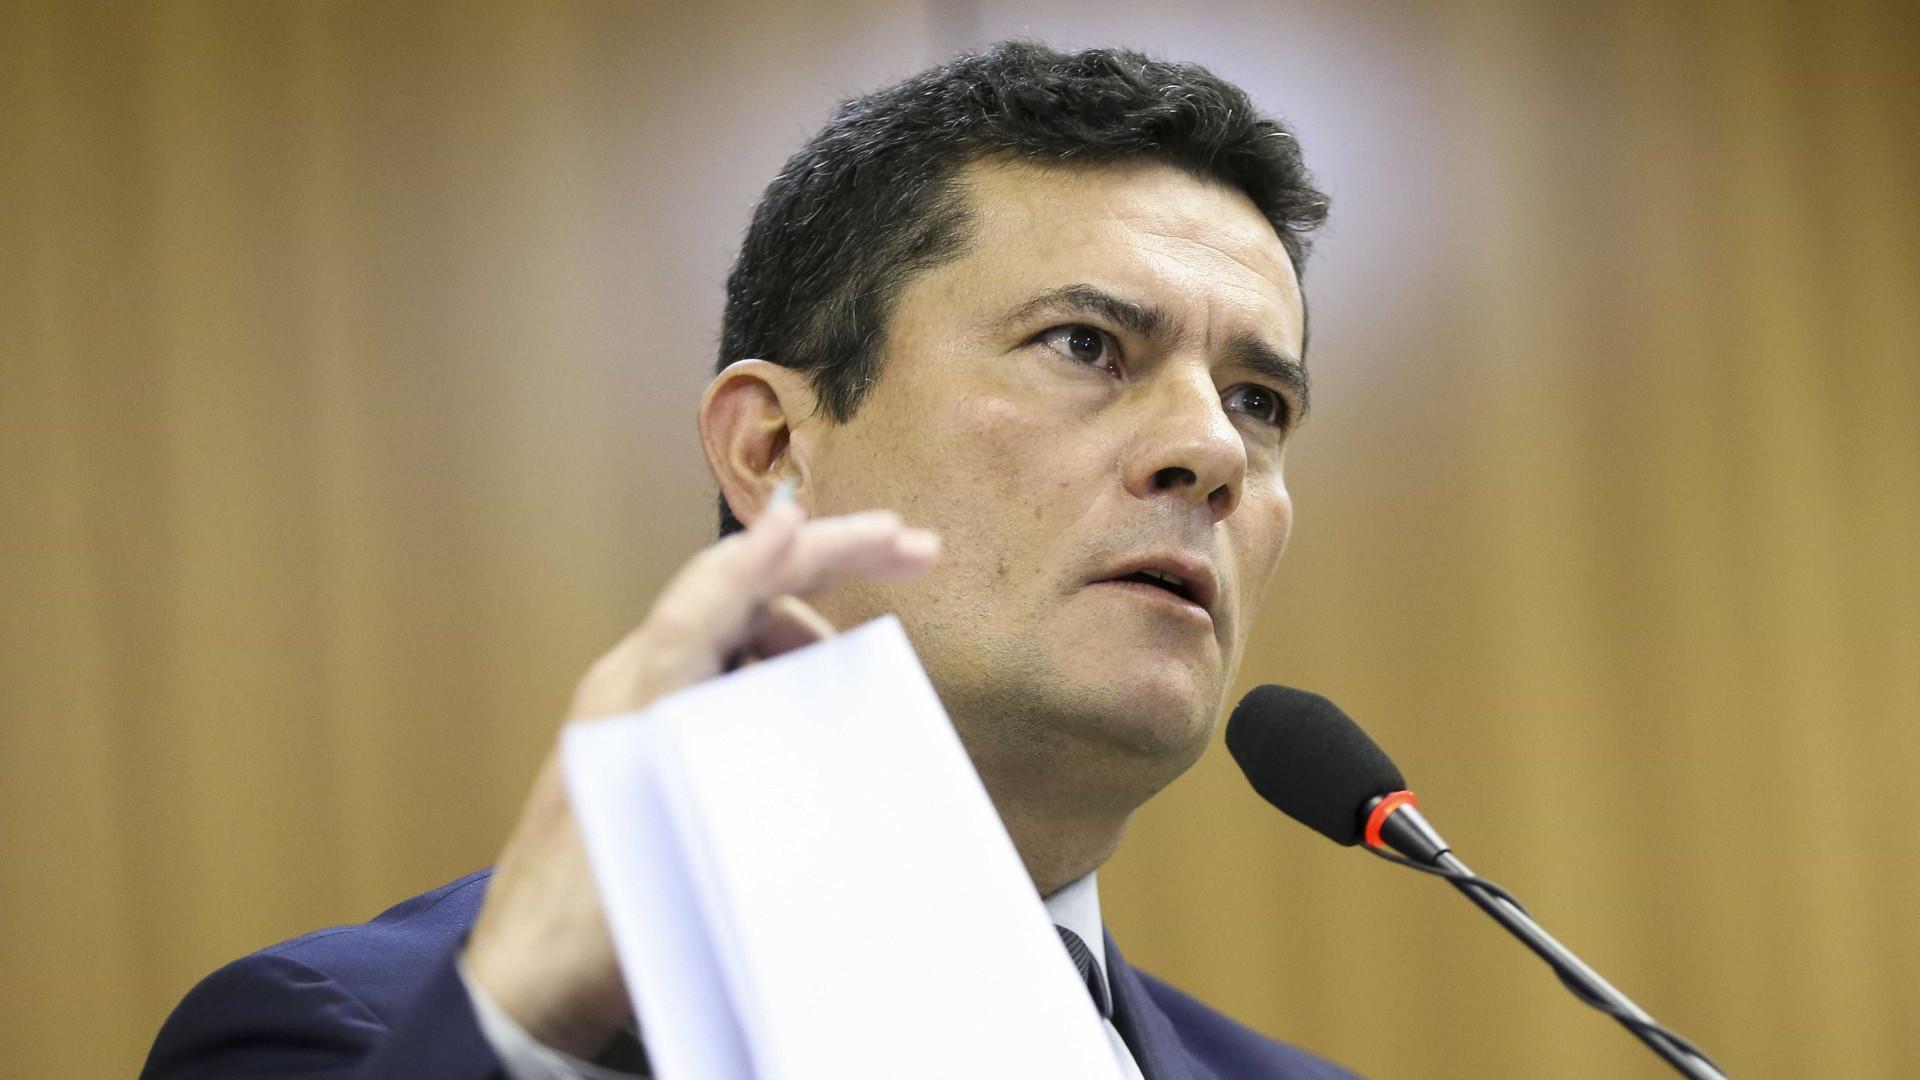 Moro: pacote anticrime endurece pena só para criminalidade mais grave